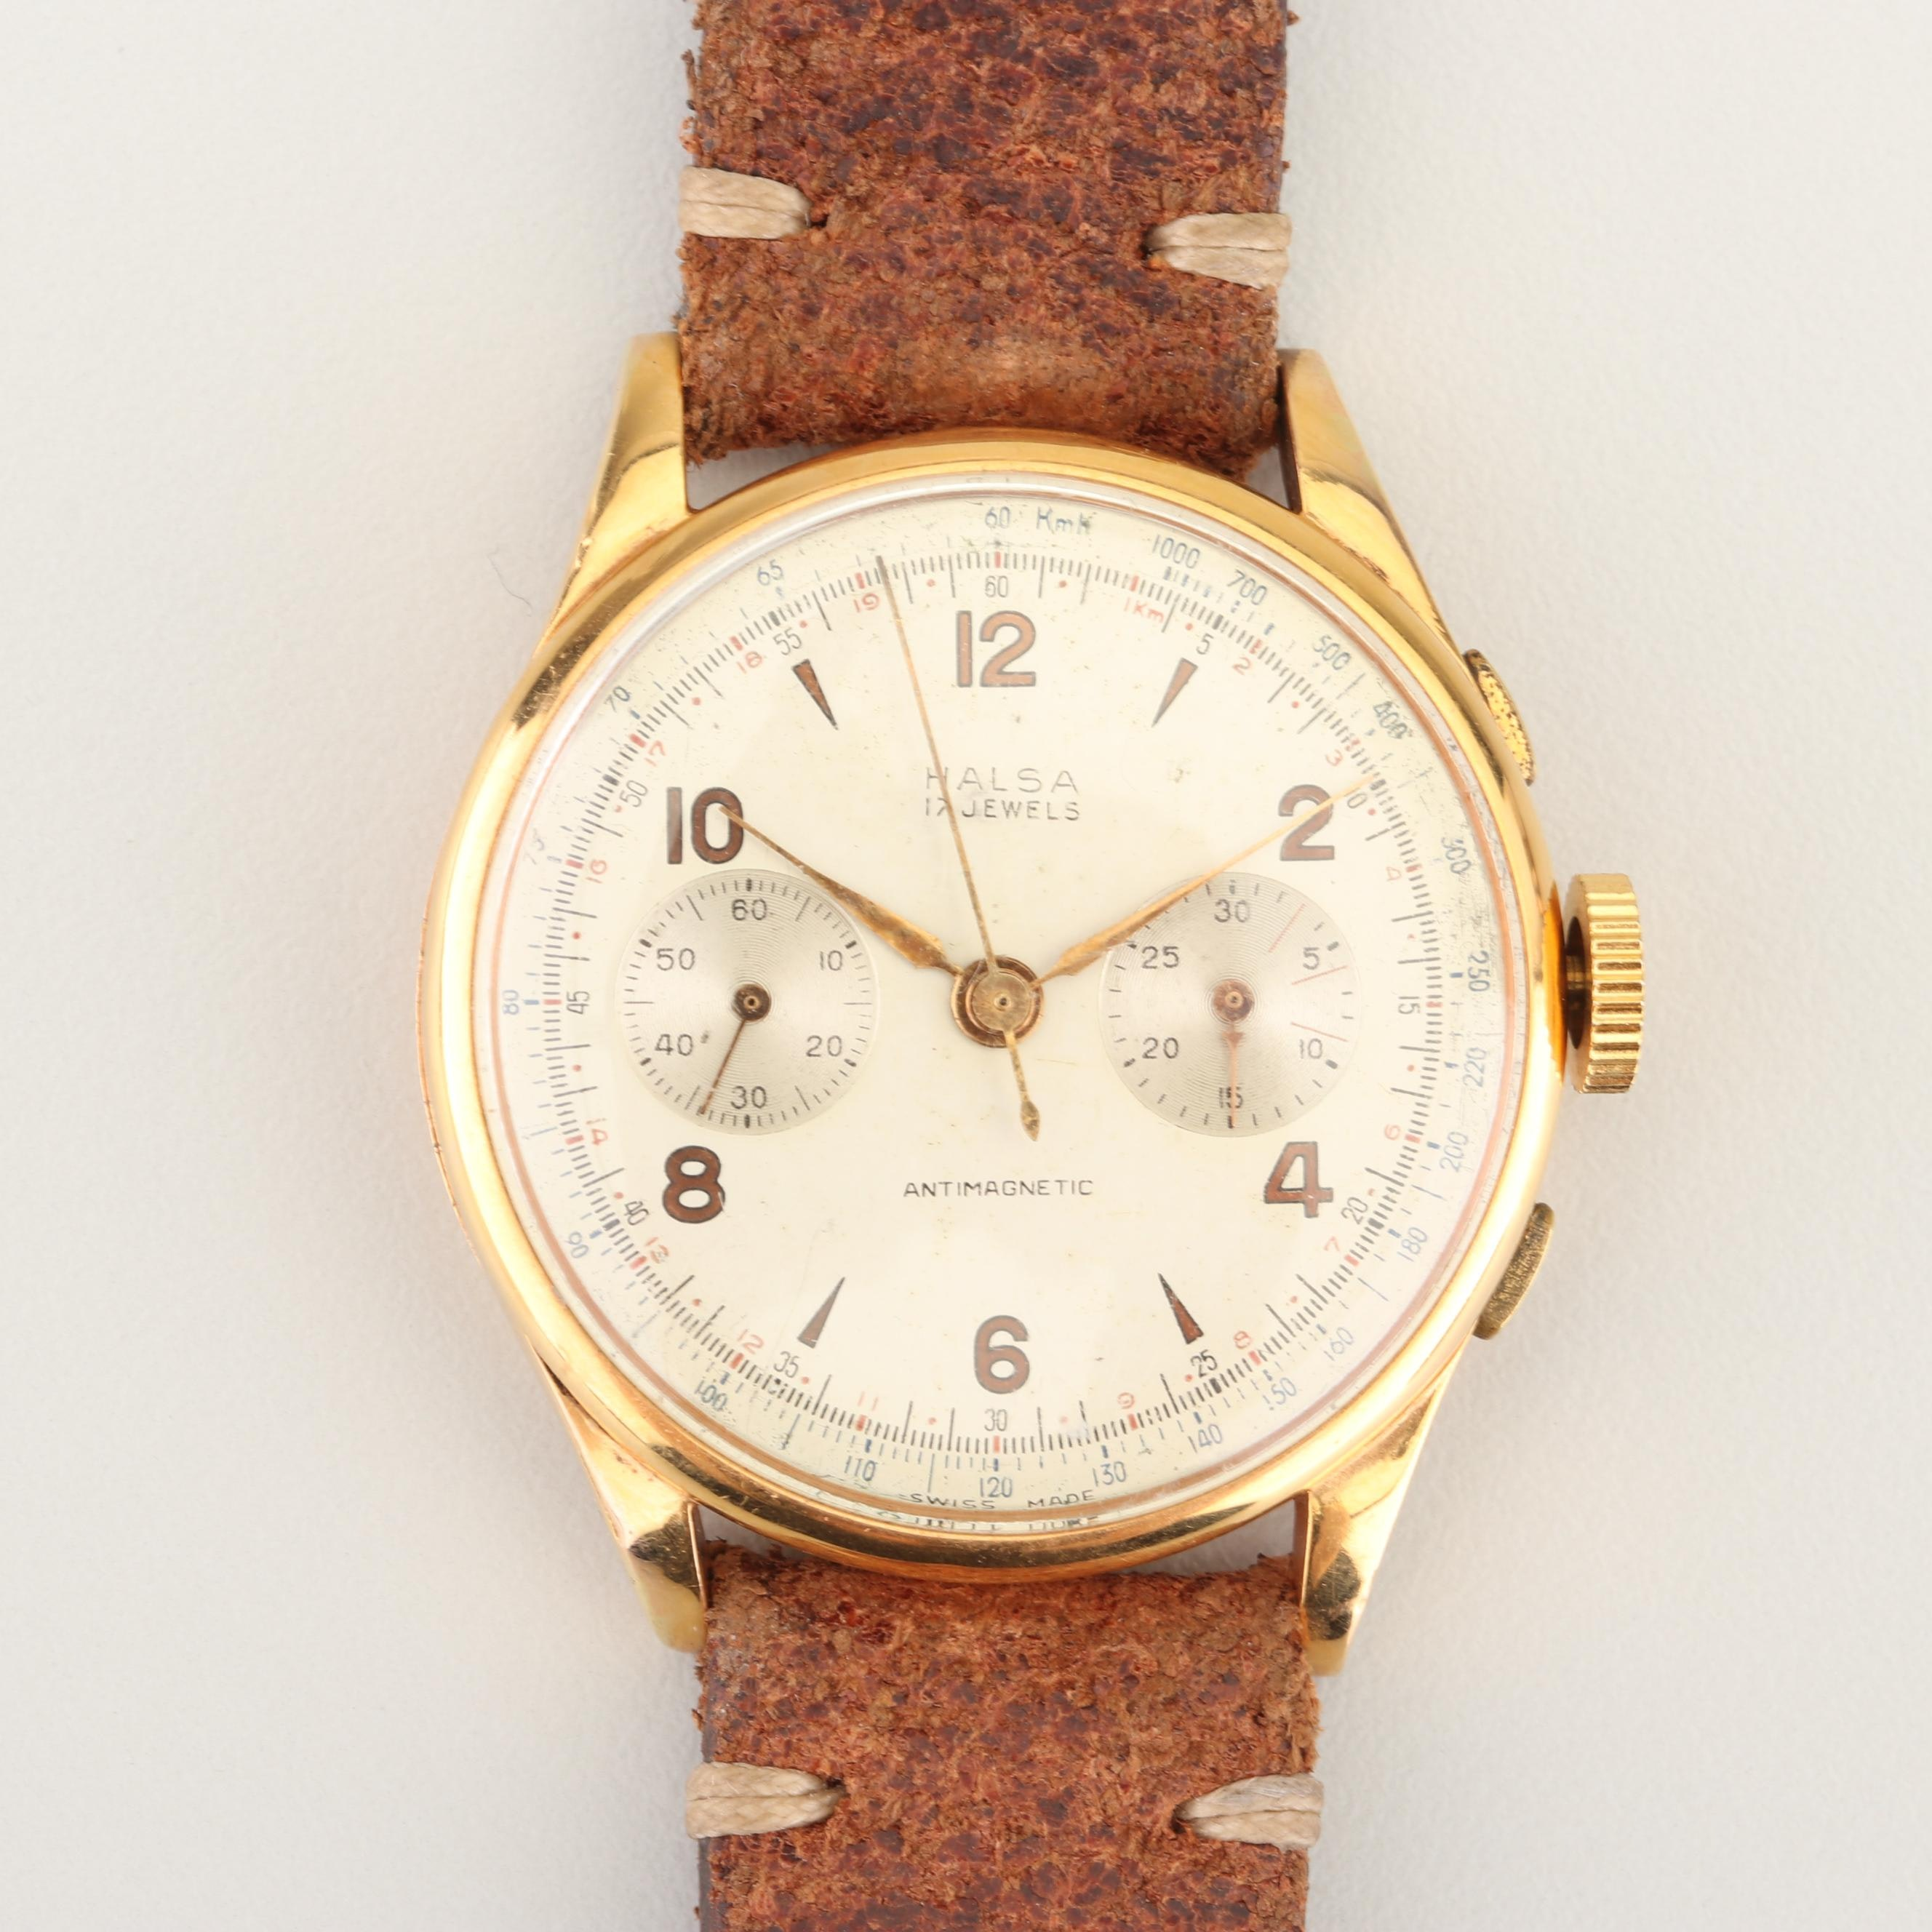 Vintage Halsa 18K Yellow Gold Wristwatch